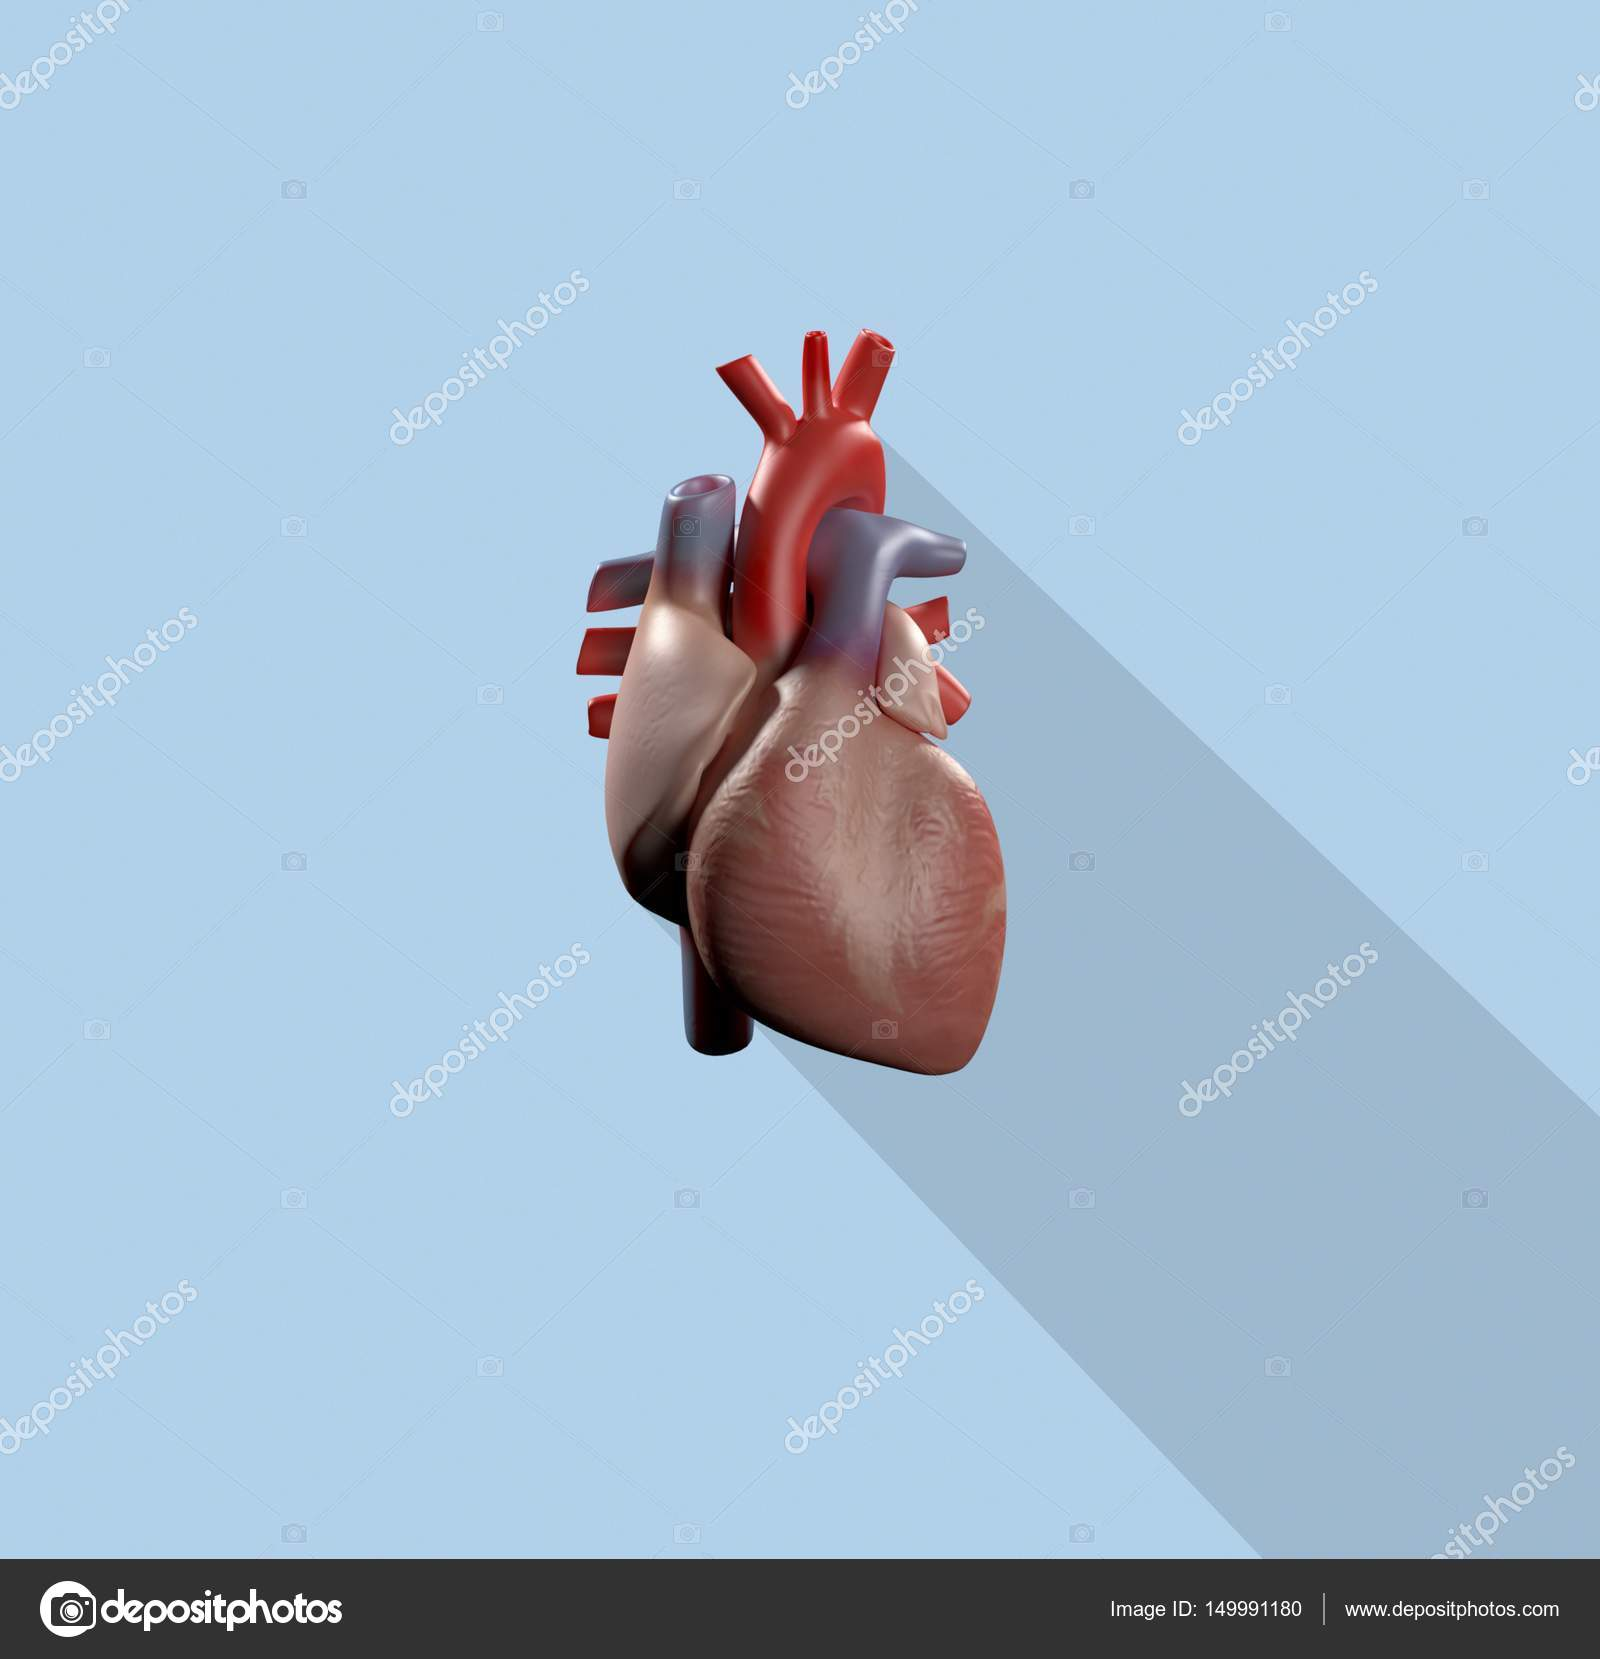 Human heart anatomy model icon — Stock Photo © AnatomyInsider #149991180